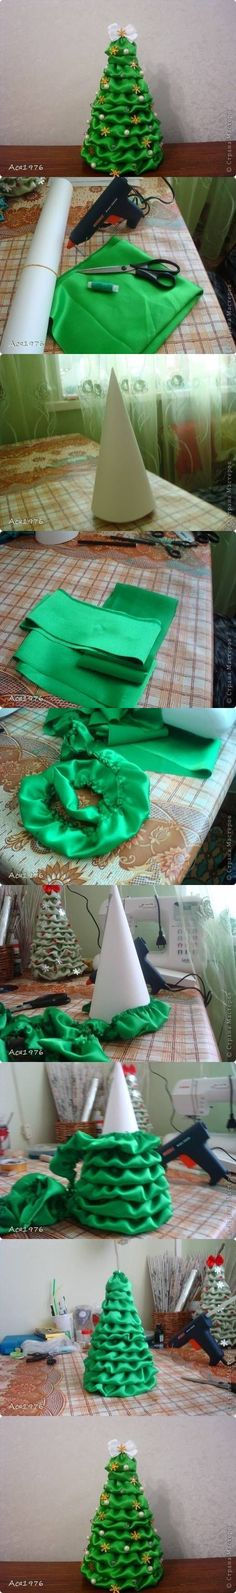 DIY Fabric Christmas Tree DIY Projects | UsefulDIY.com Follow Us on Facebook ==> http://www.facebook.com/UsefulDiy